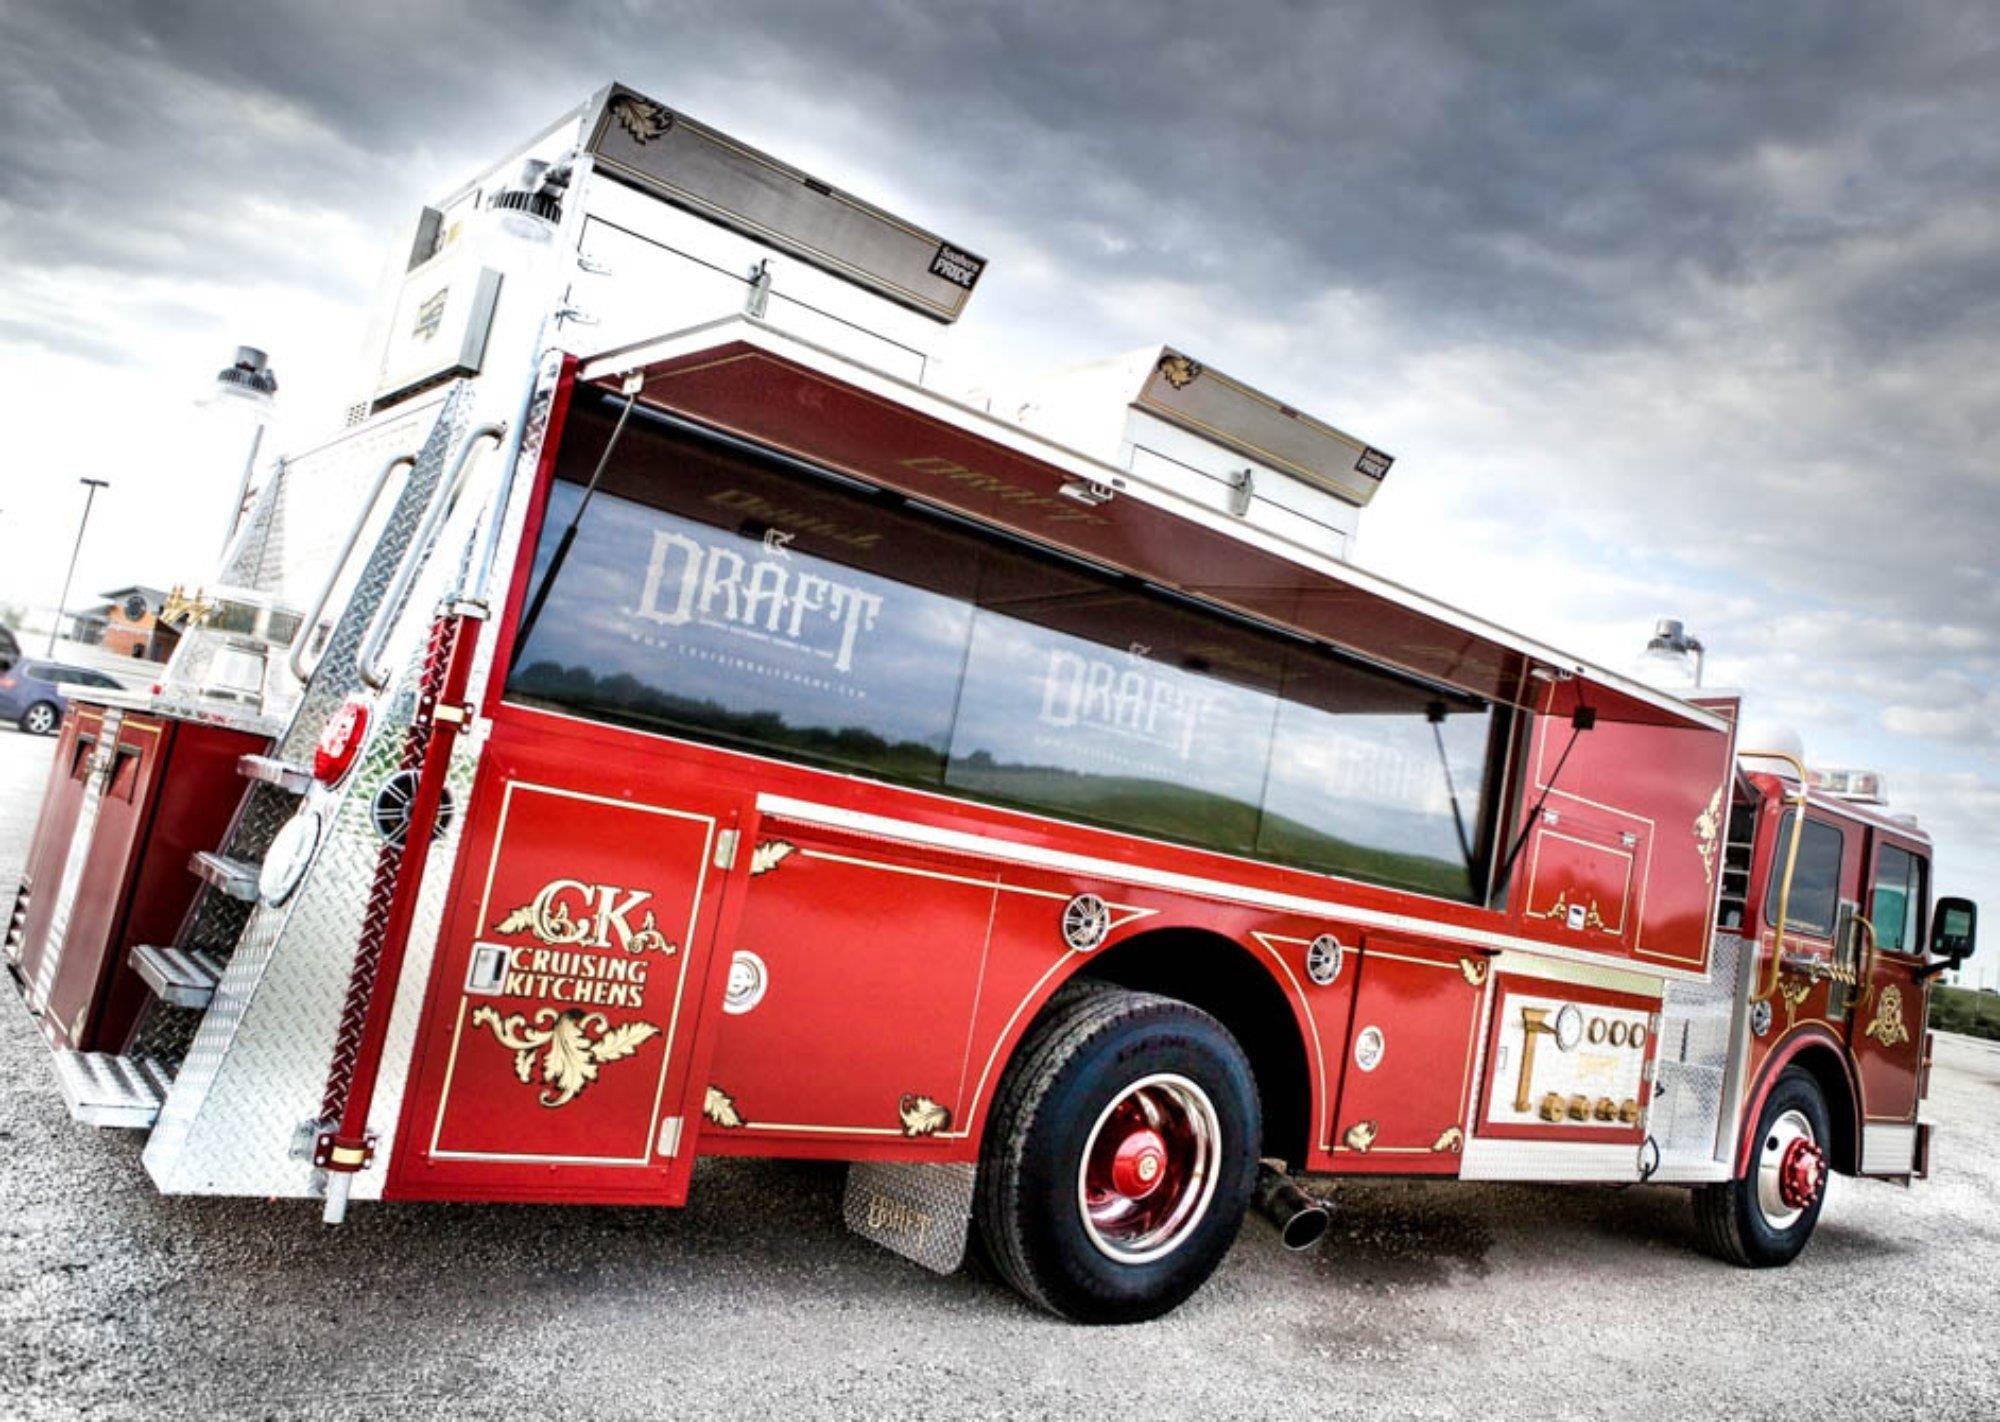 Draft dynamic restaurant aboard fire truck built by